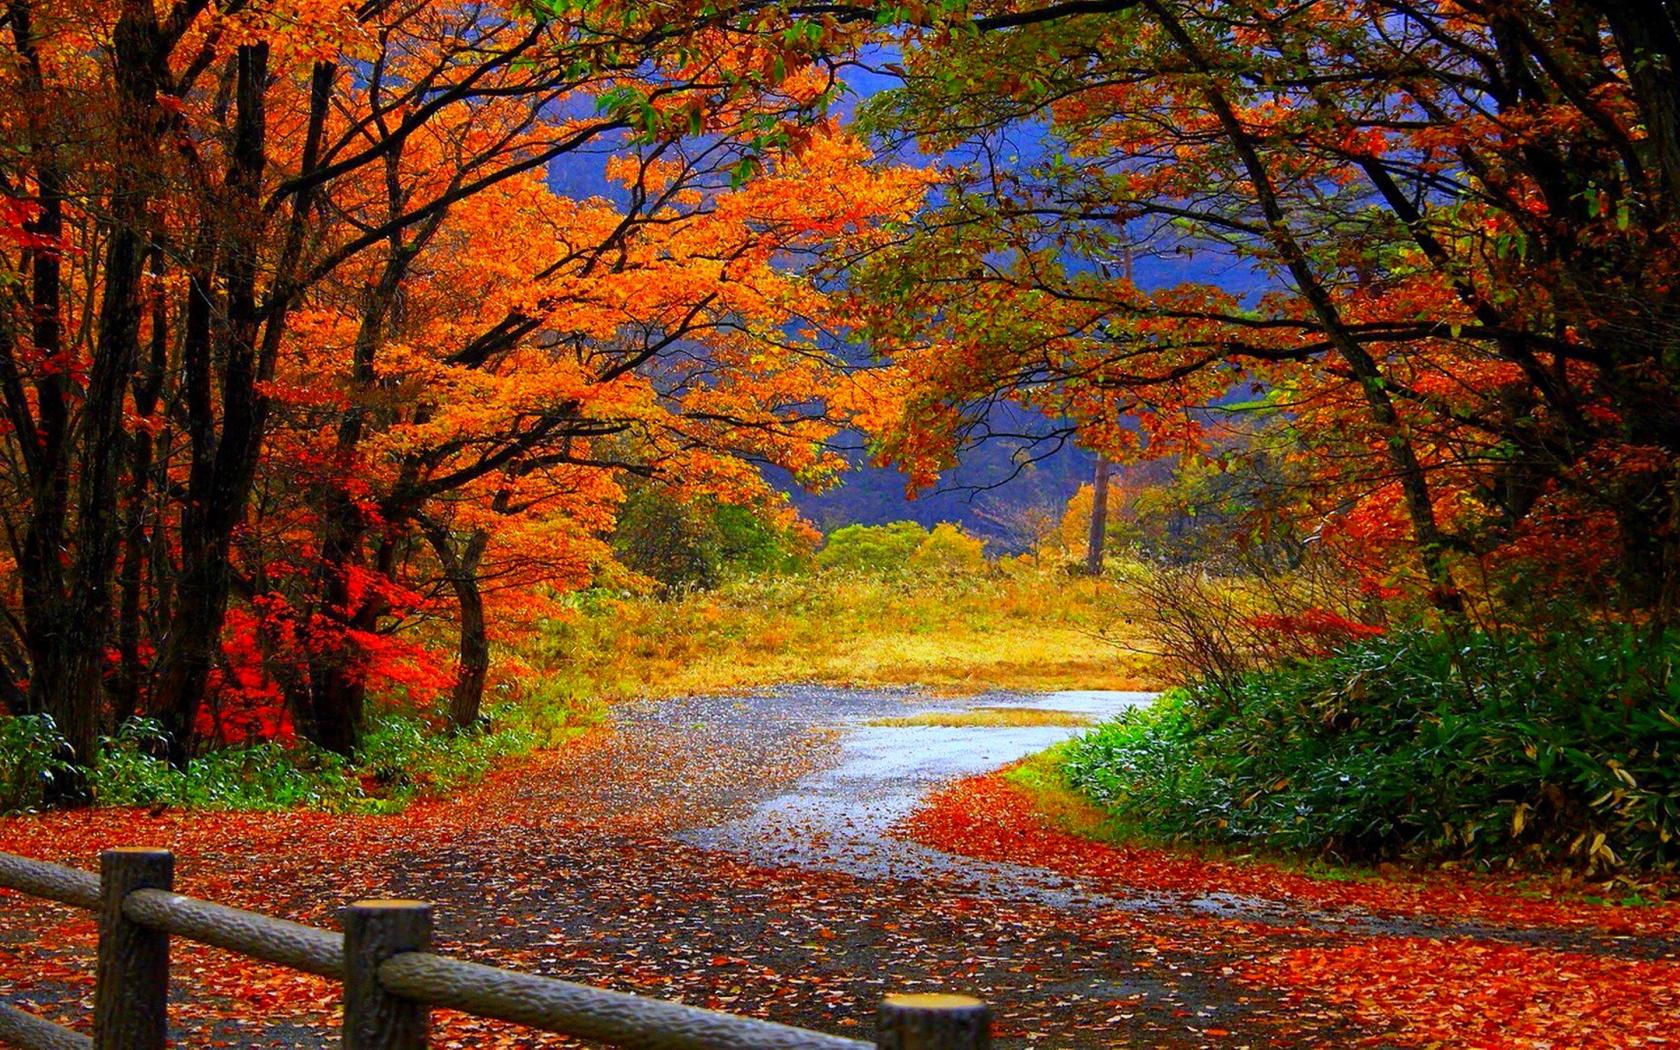 autumn wallpapers hd autumn morning wallpaper autumn wallpapers hd 1680x1050